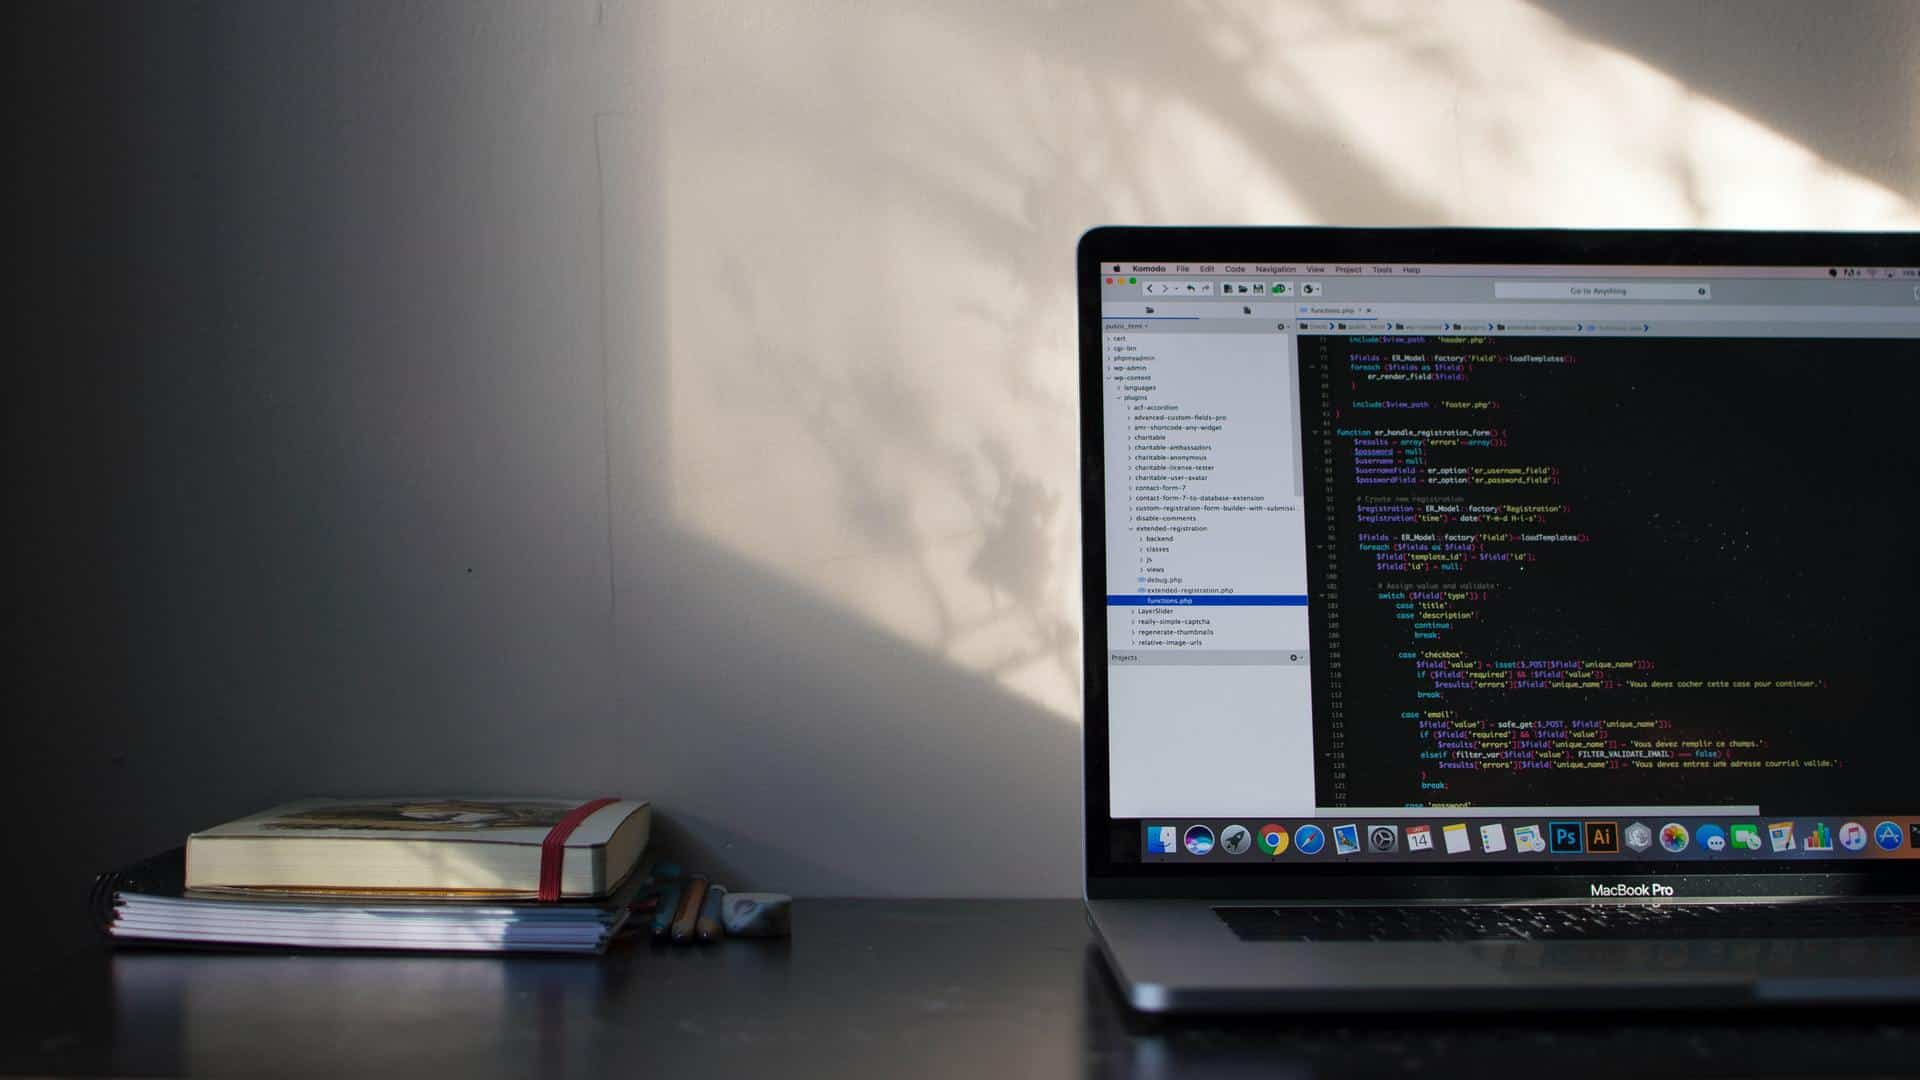 Laptop running code editor